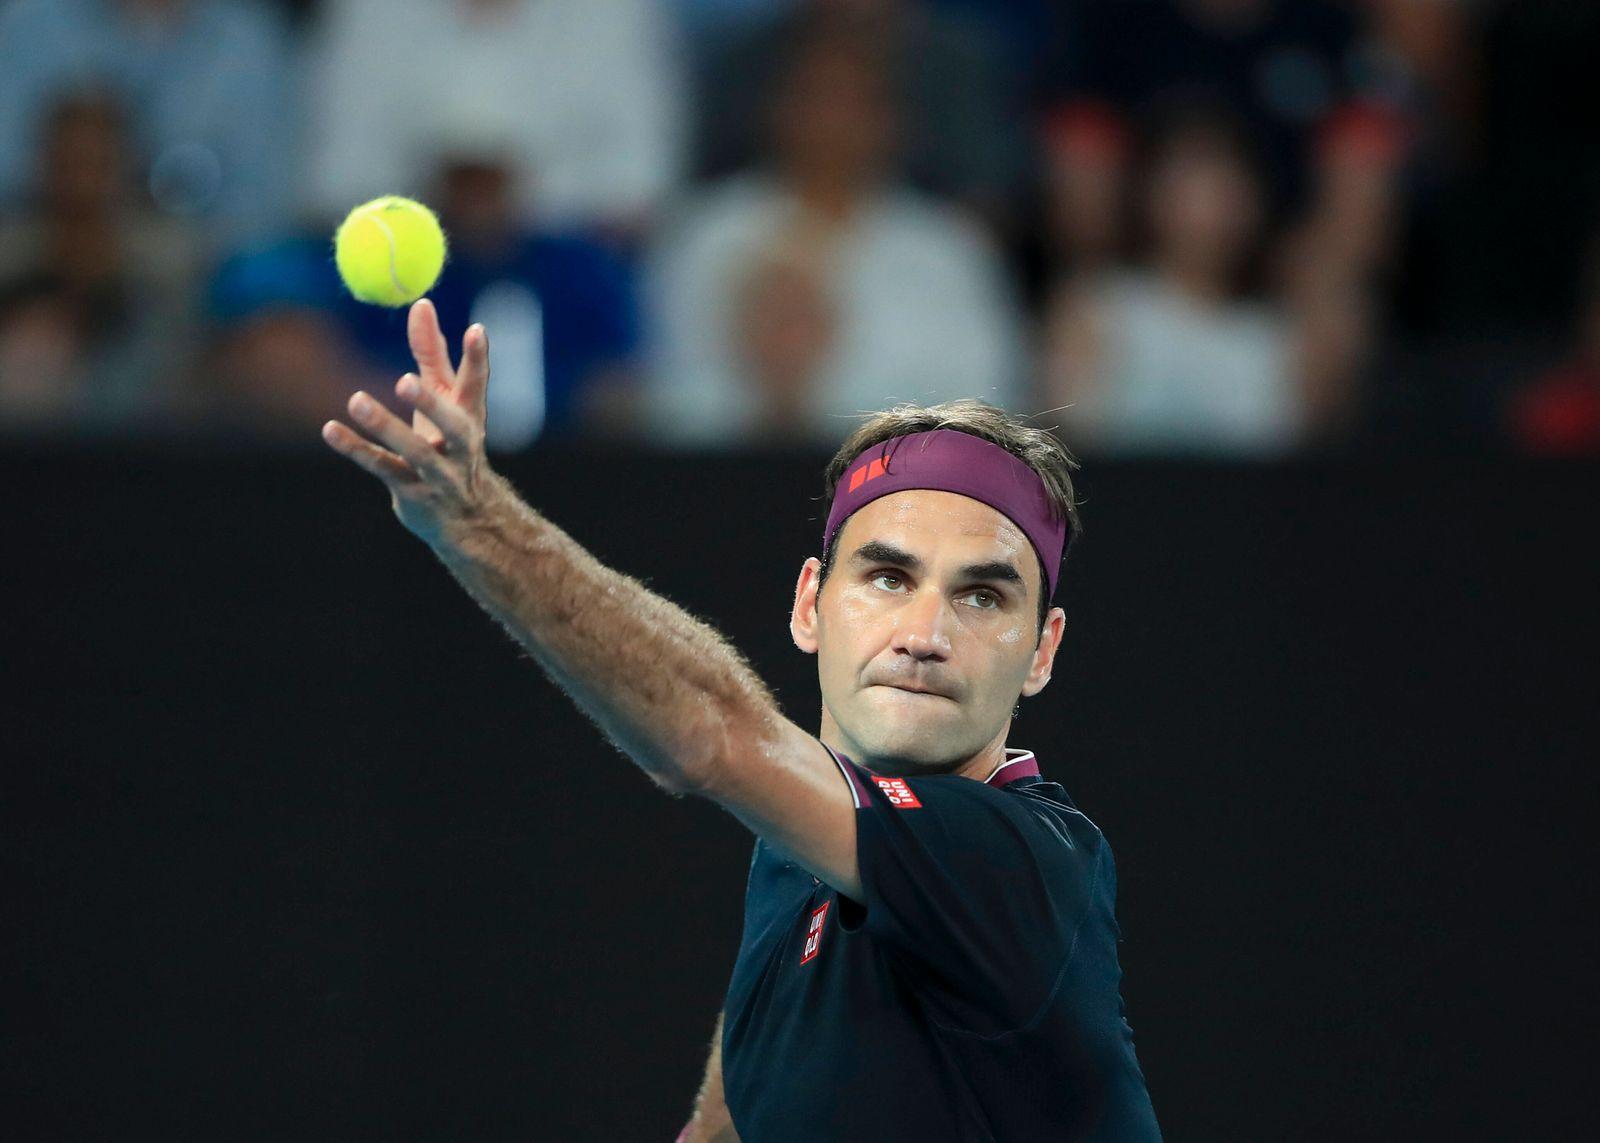 Roger Federer (SUI) Tennis - Australian Open 2017 - Grand Slam / ATP, Tennis Herren / WTA, Tennis Damen - Melbourne Par